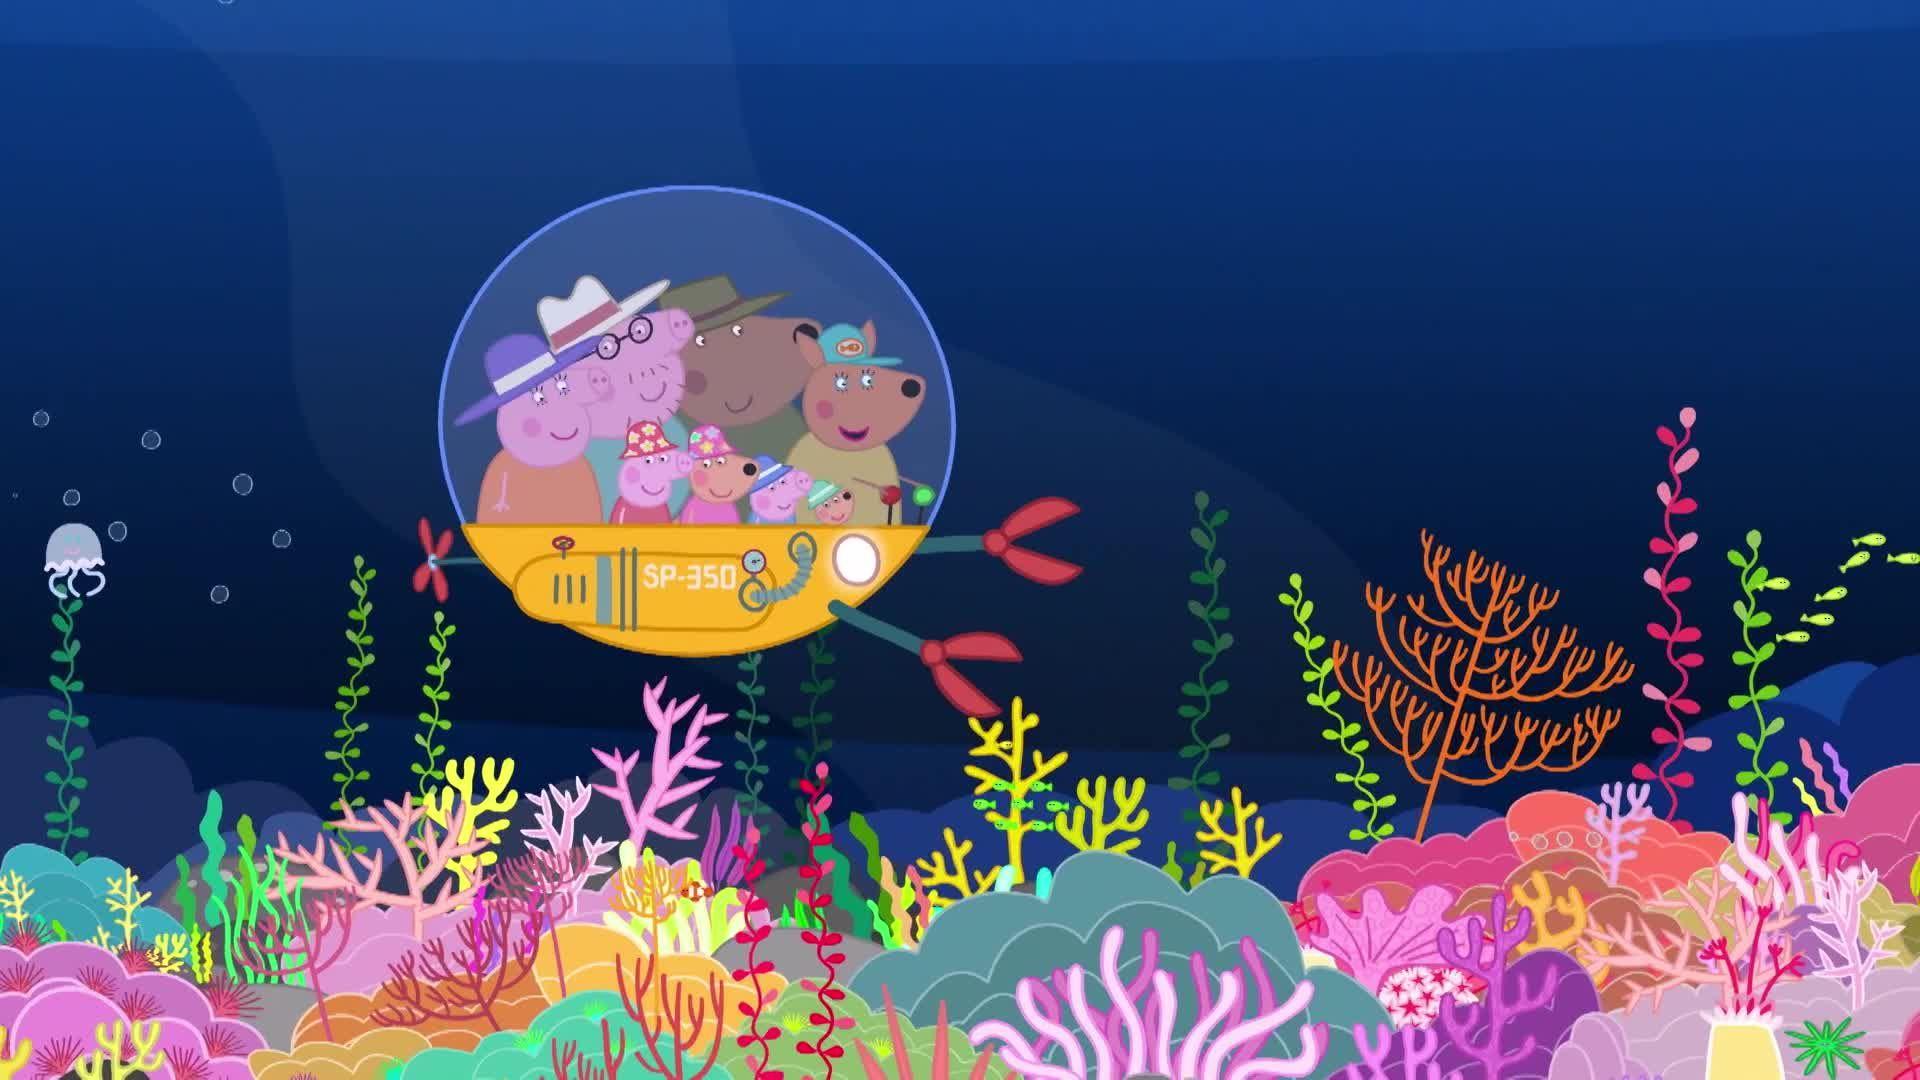 Peppa Pig: The Great Barrier Reef